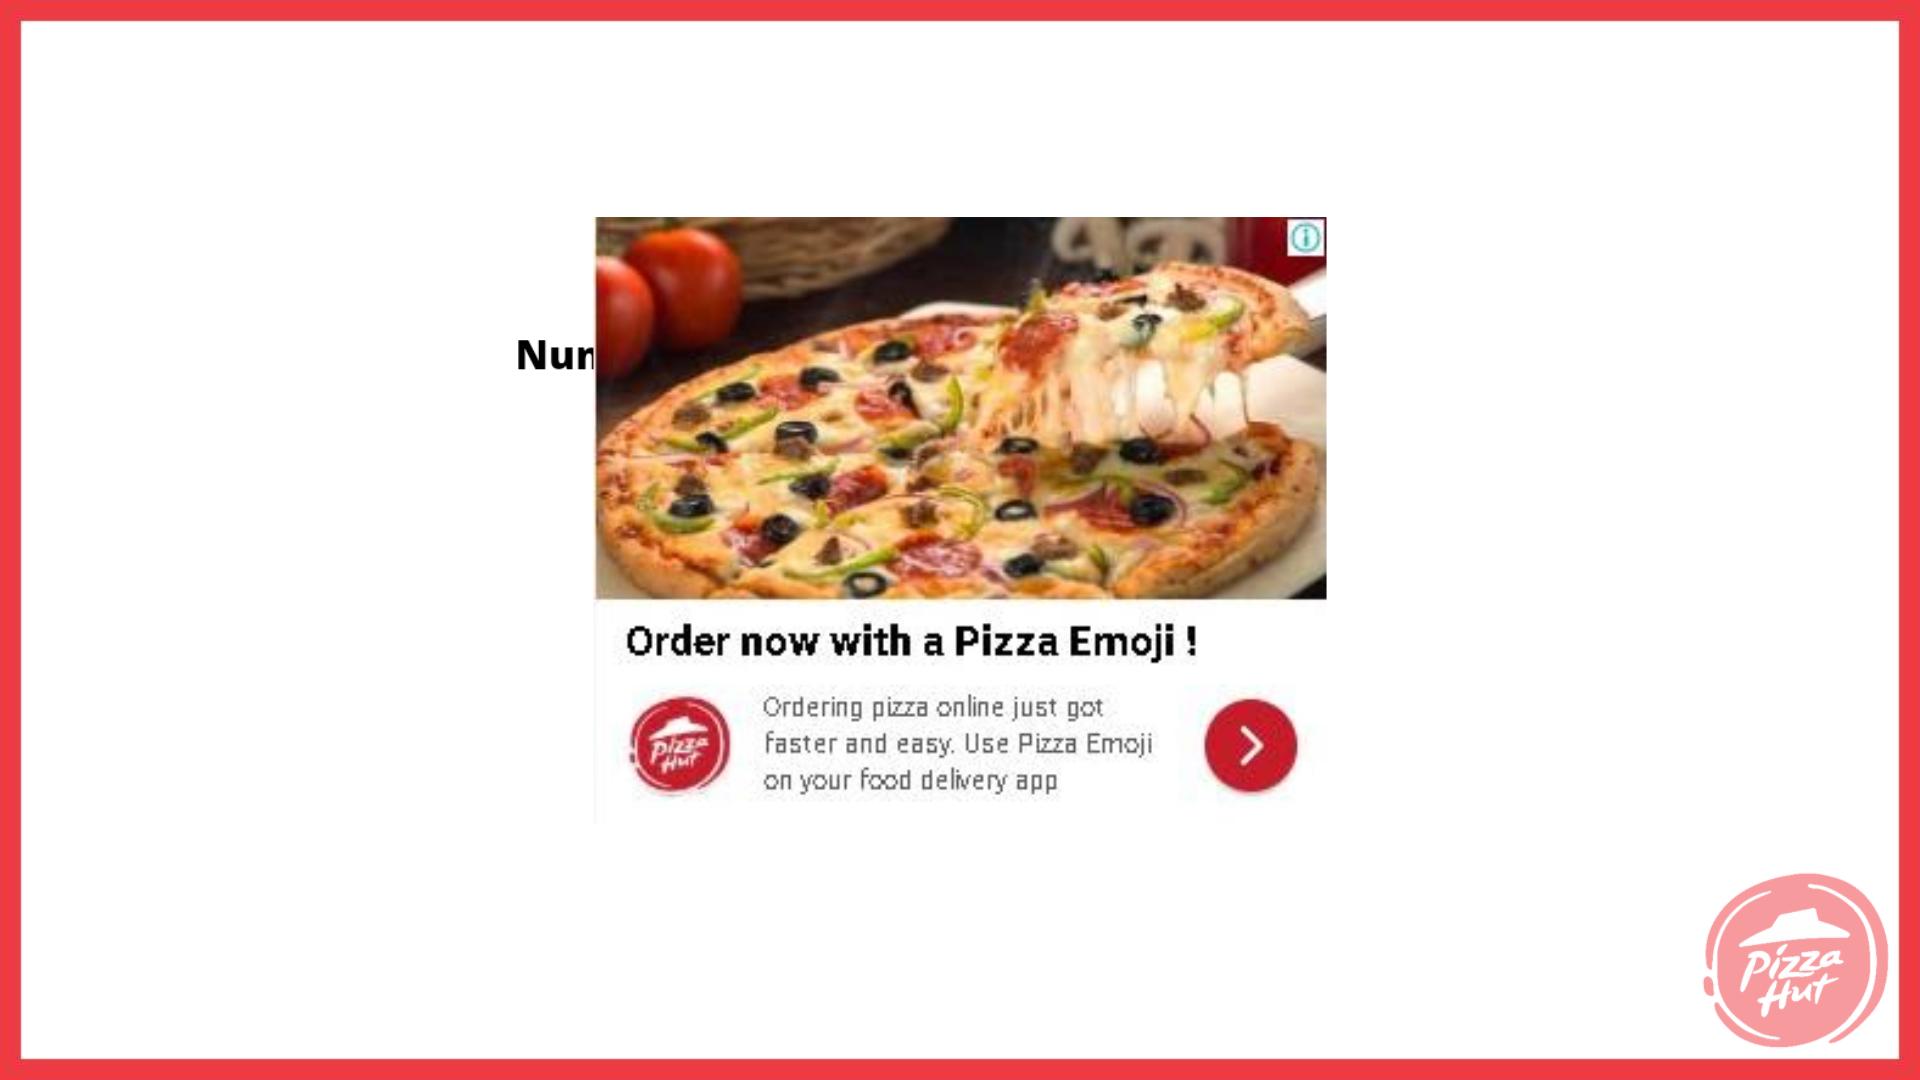 pizza hut marketing strategy Paid post 3 - Pizza Hut Marketing and Advertising Strategy